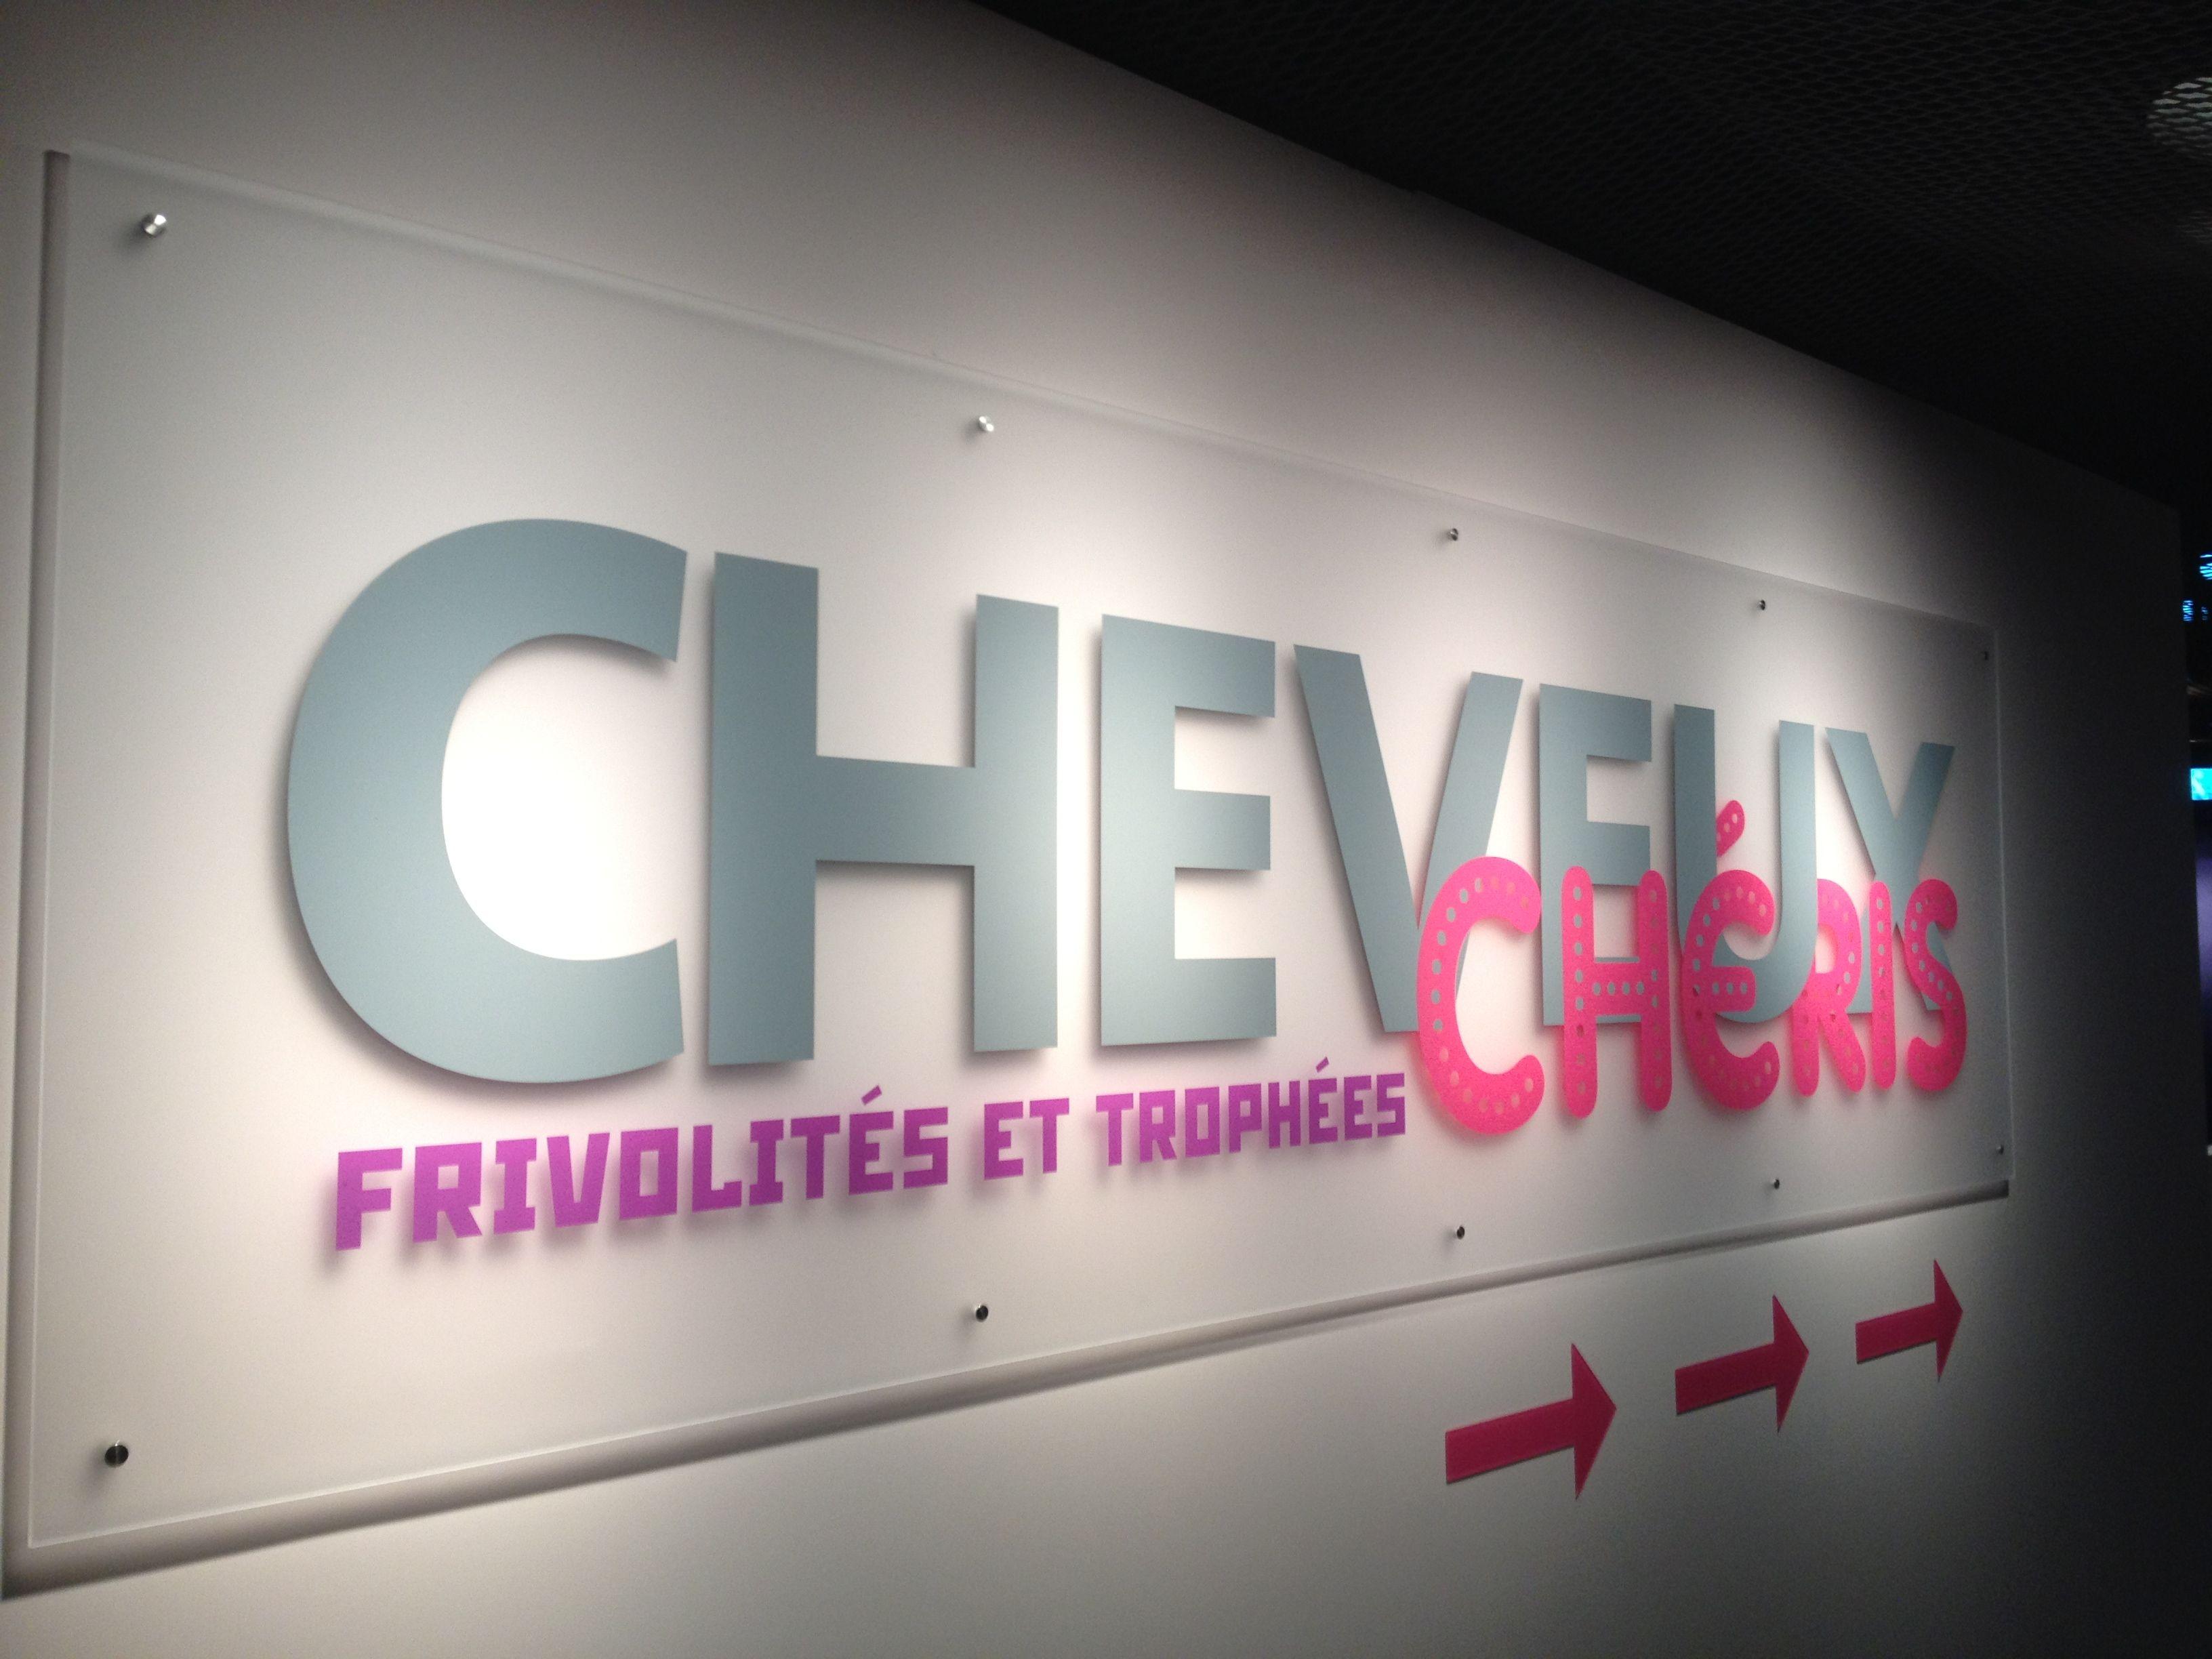 cheveux chéris_PHYTO expo quai Branly